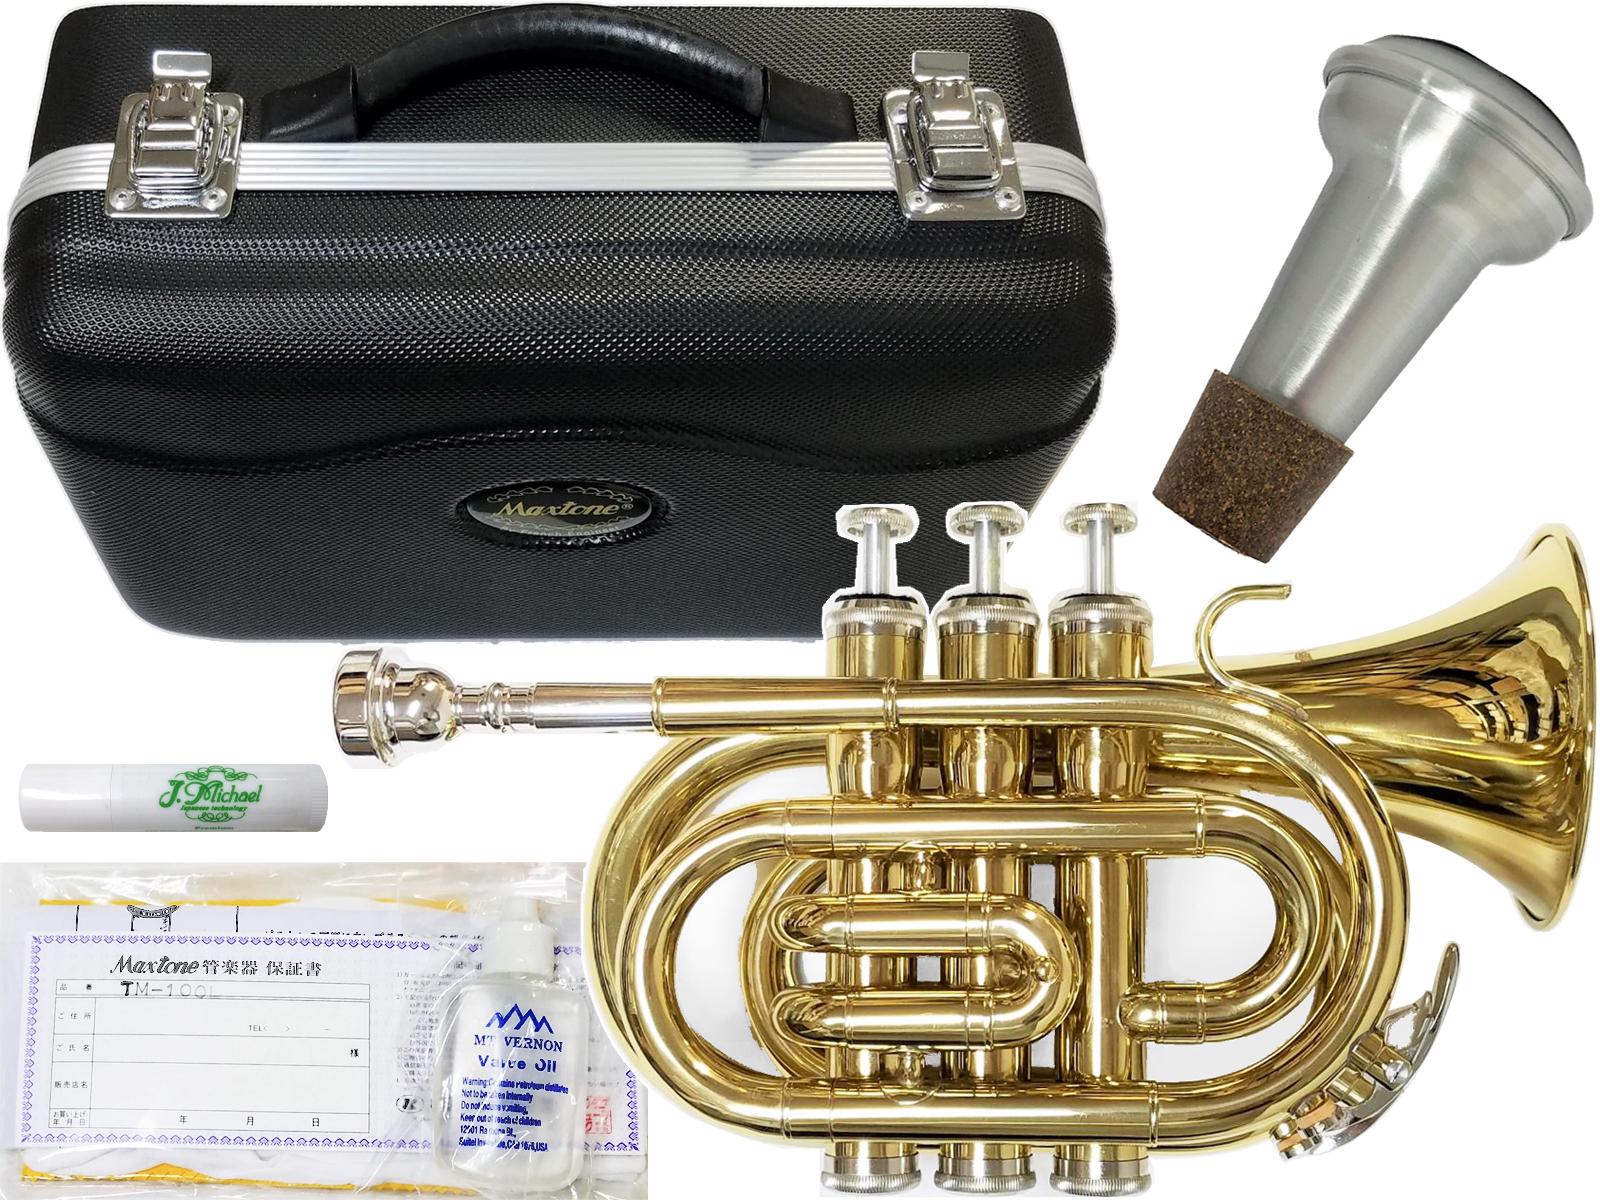 MAXTONE ( マックストーン ) TM-100L ポケットトランペット ゴールド 新品 管楽器 ミニ トランペット B♭管 本体  pocket Trumpet Gold TM100L セット A